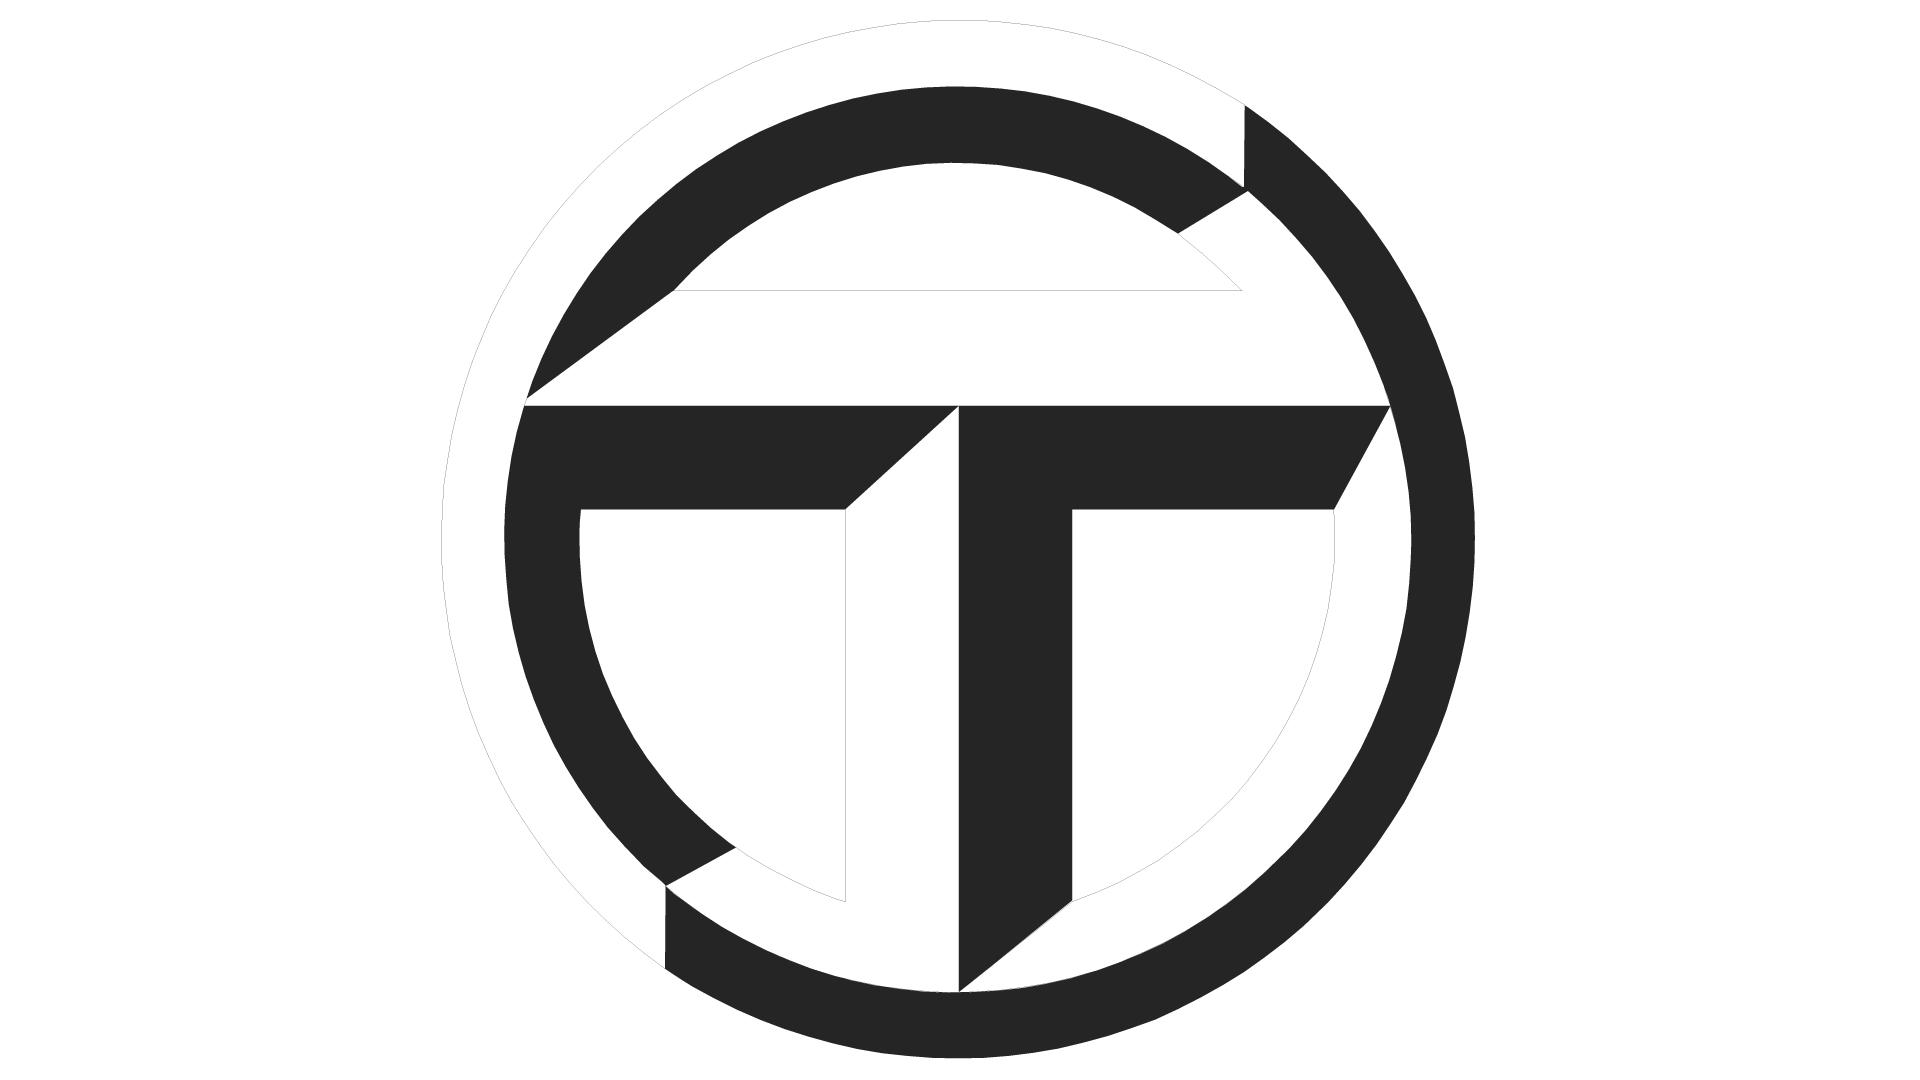 Pin De Marque Voiture Em Logos Automobiles